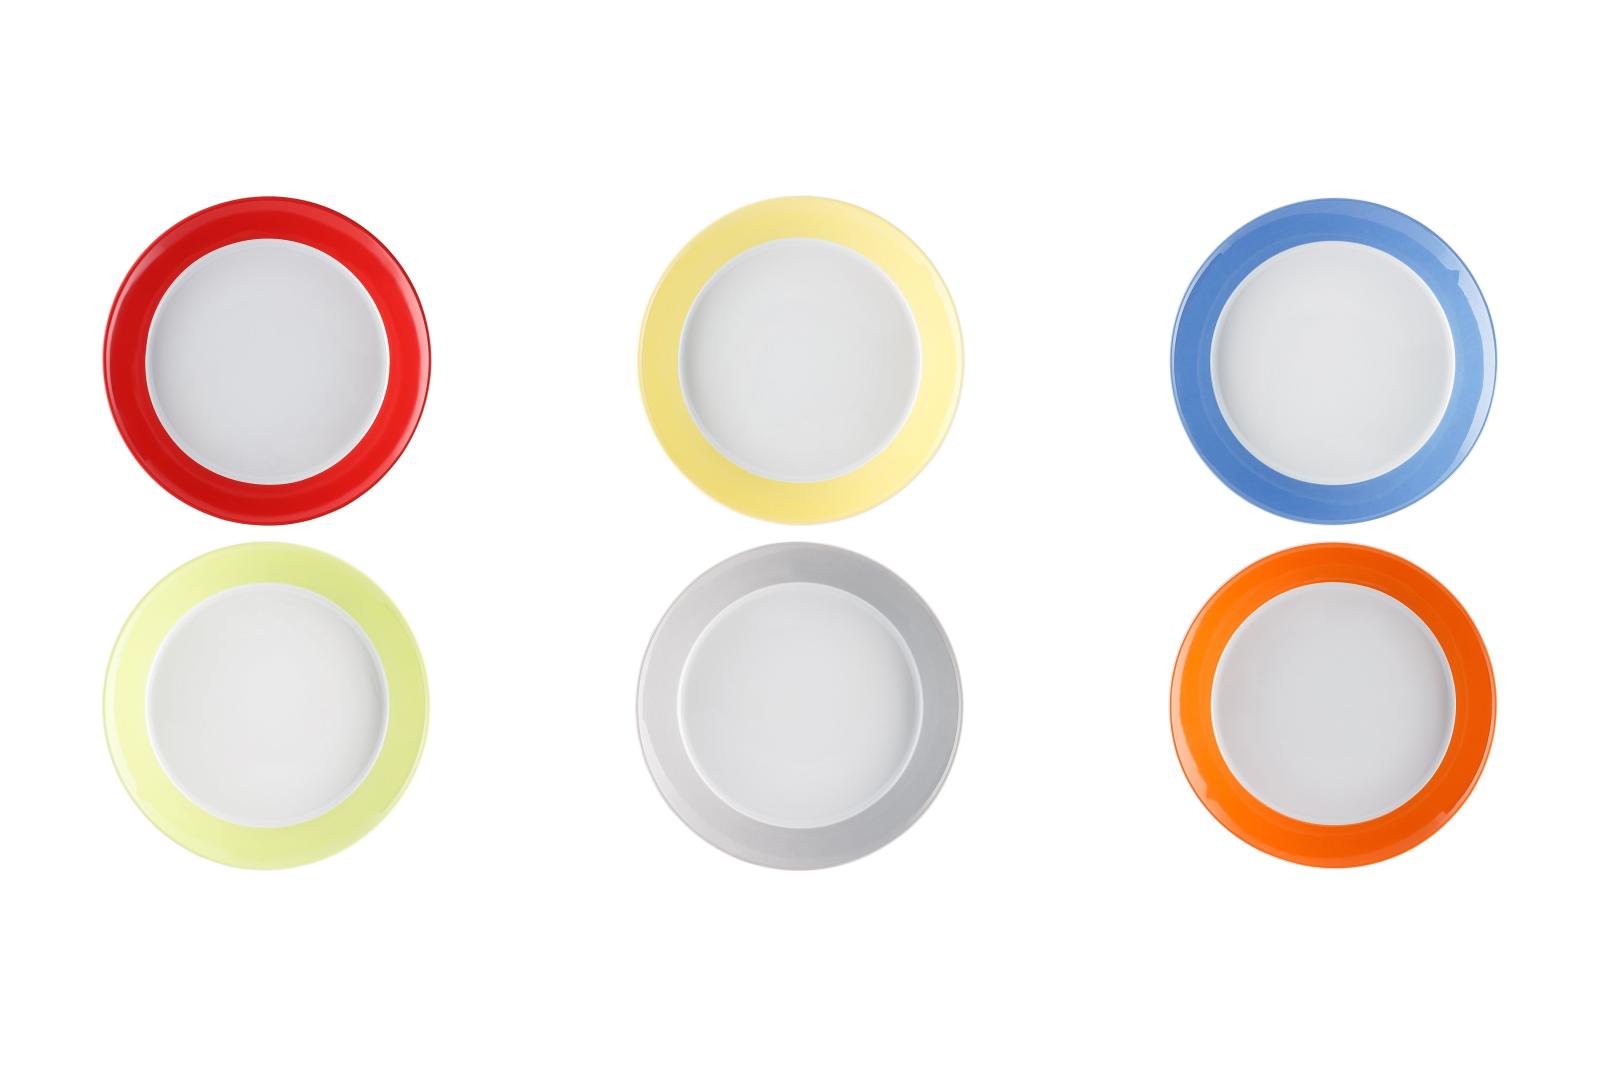 6 x Soup Plates 21 CM-TRIC Colourful-Arzberg-Assorted Colours